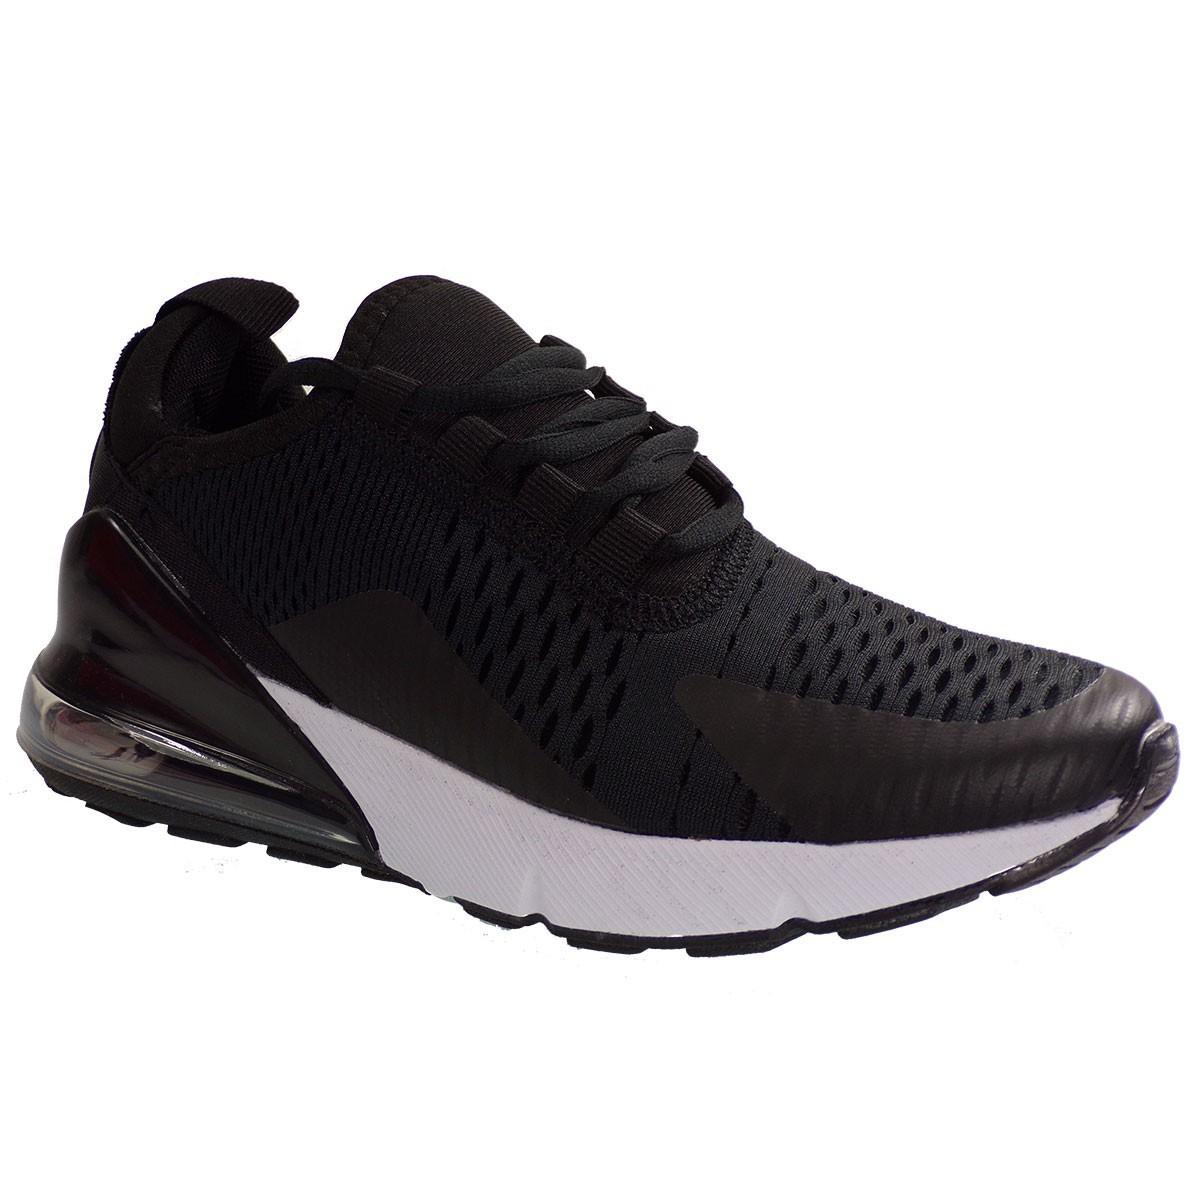 Bagiota Shoes Γυναικεία Παπούτσια Sneakers Αθλητικά L-82051 Μαύρο